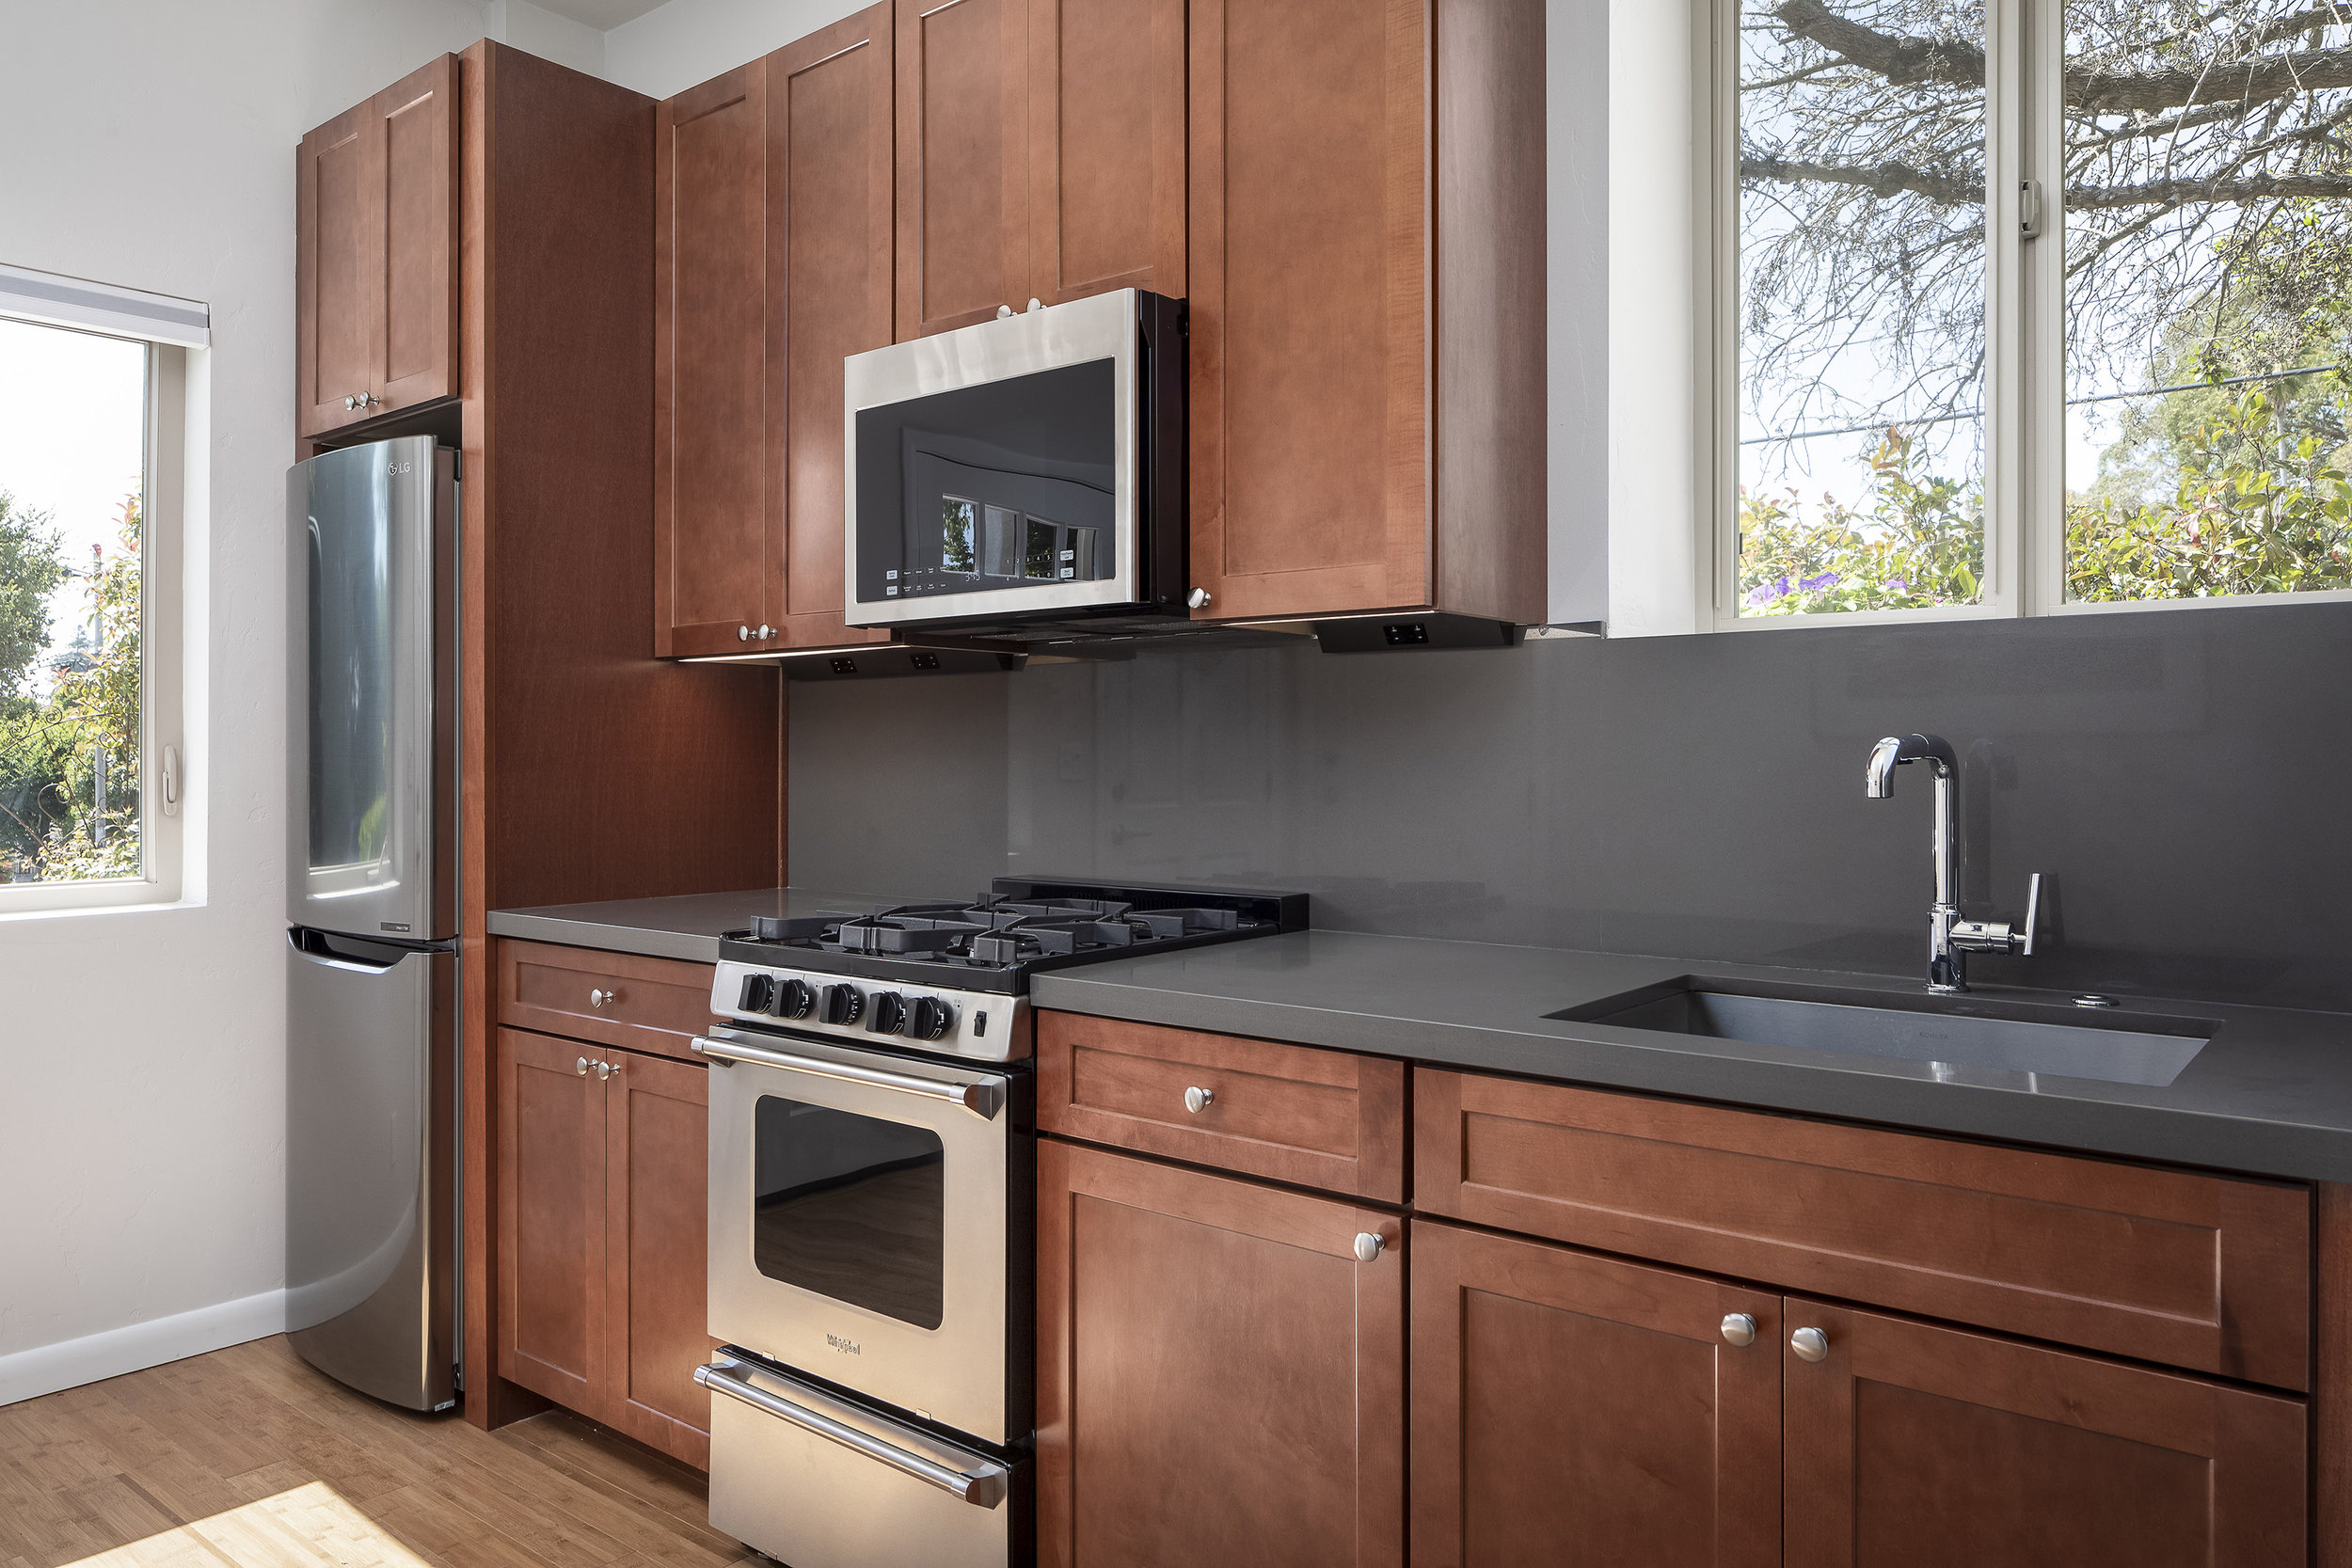 Small and efficient modern ADU kitchen